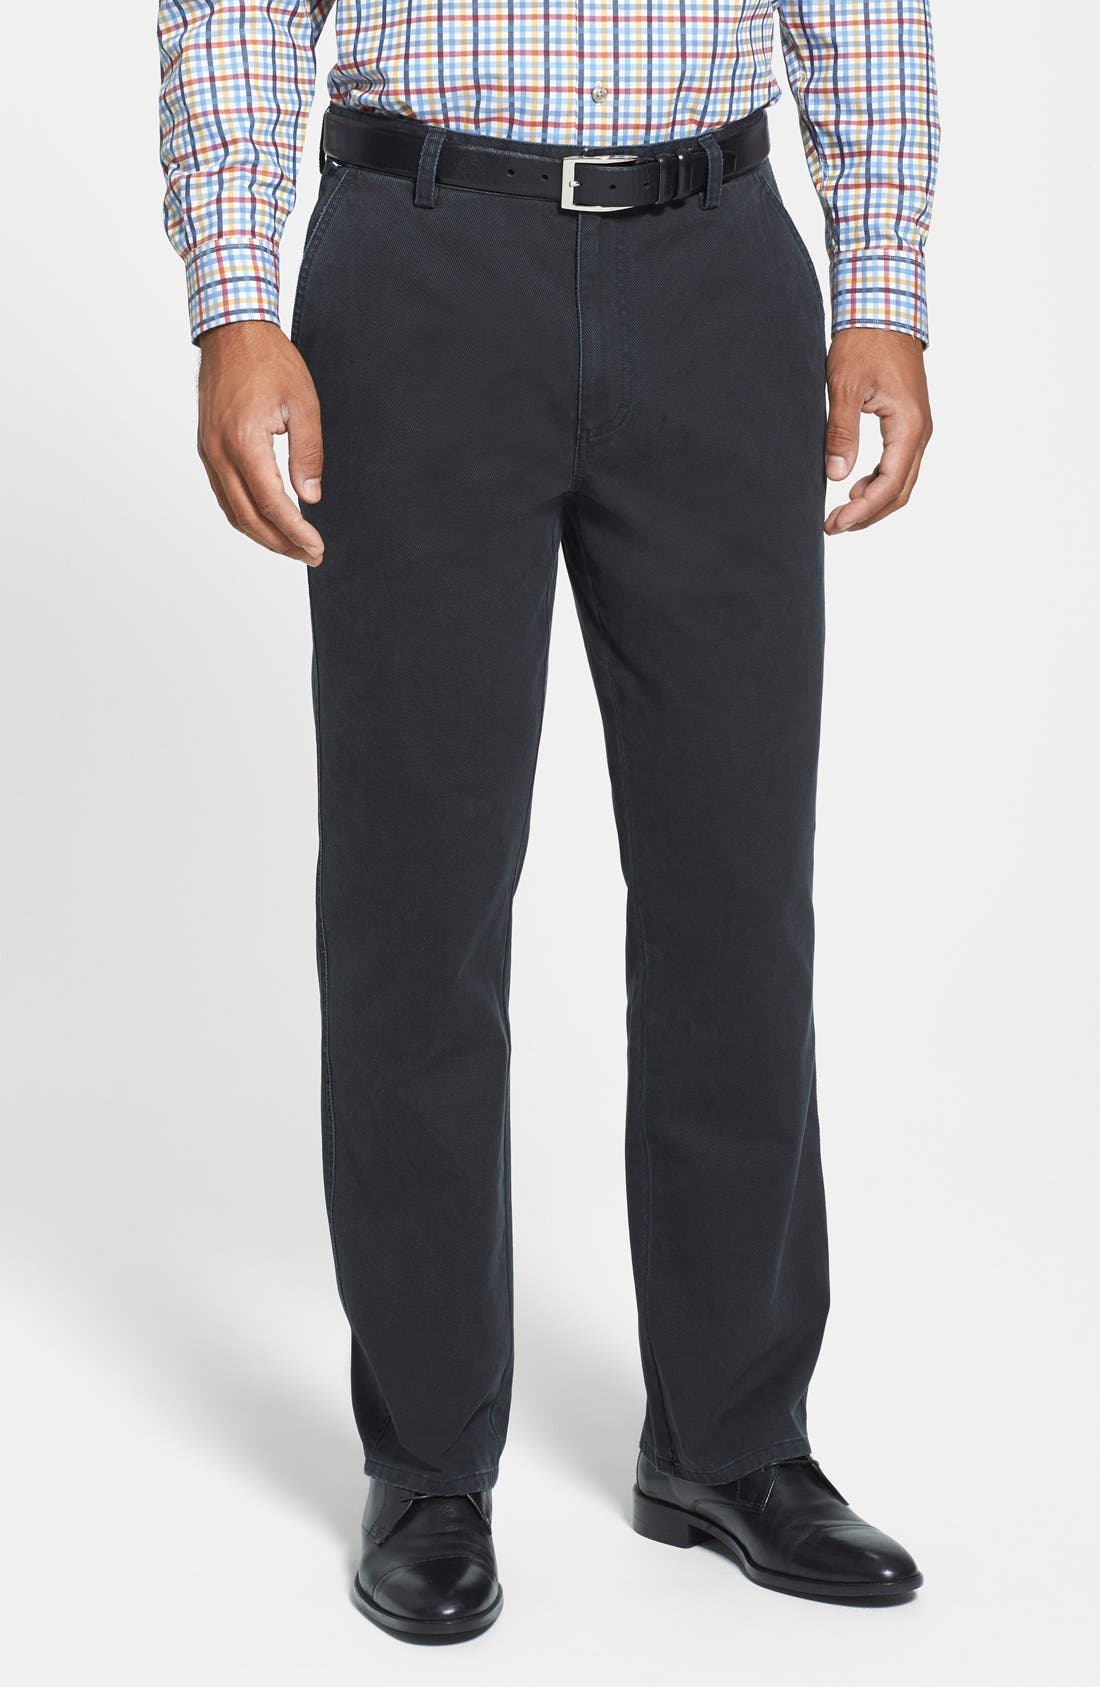 Curtis Flat Front Five-Pocket Cotton Twill Pants,                         Main,                         color, BLACK